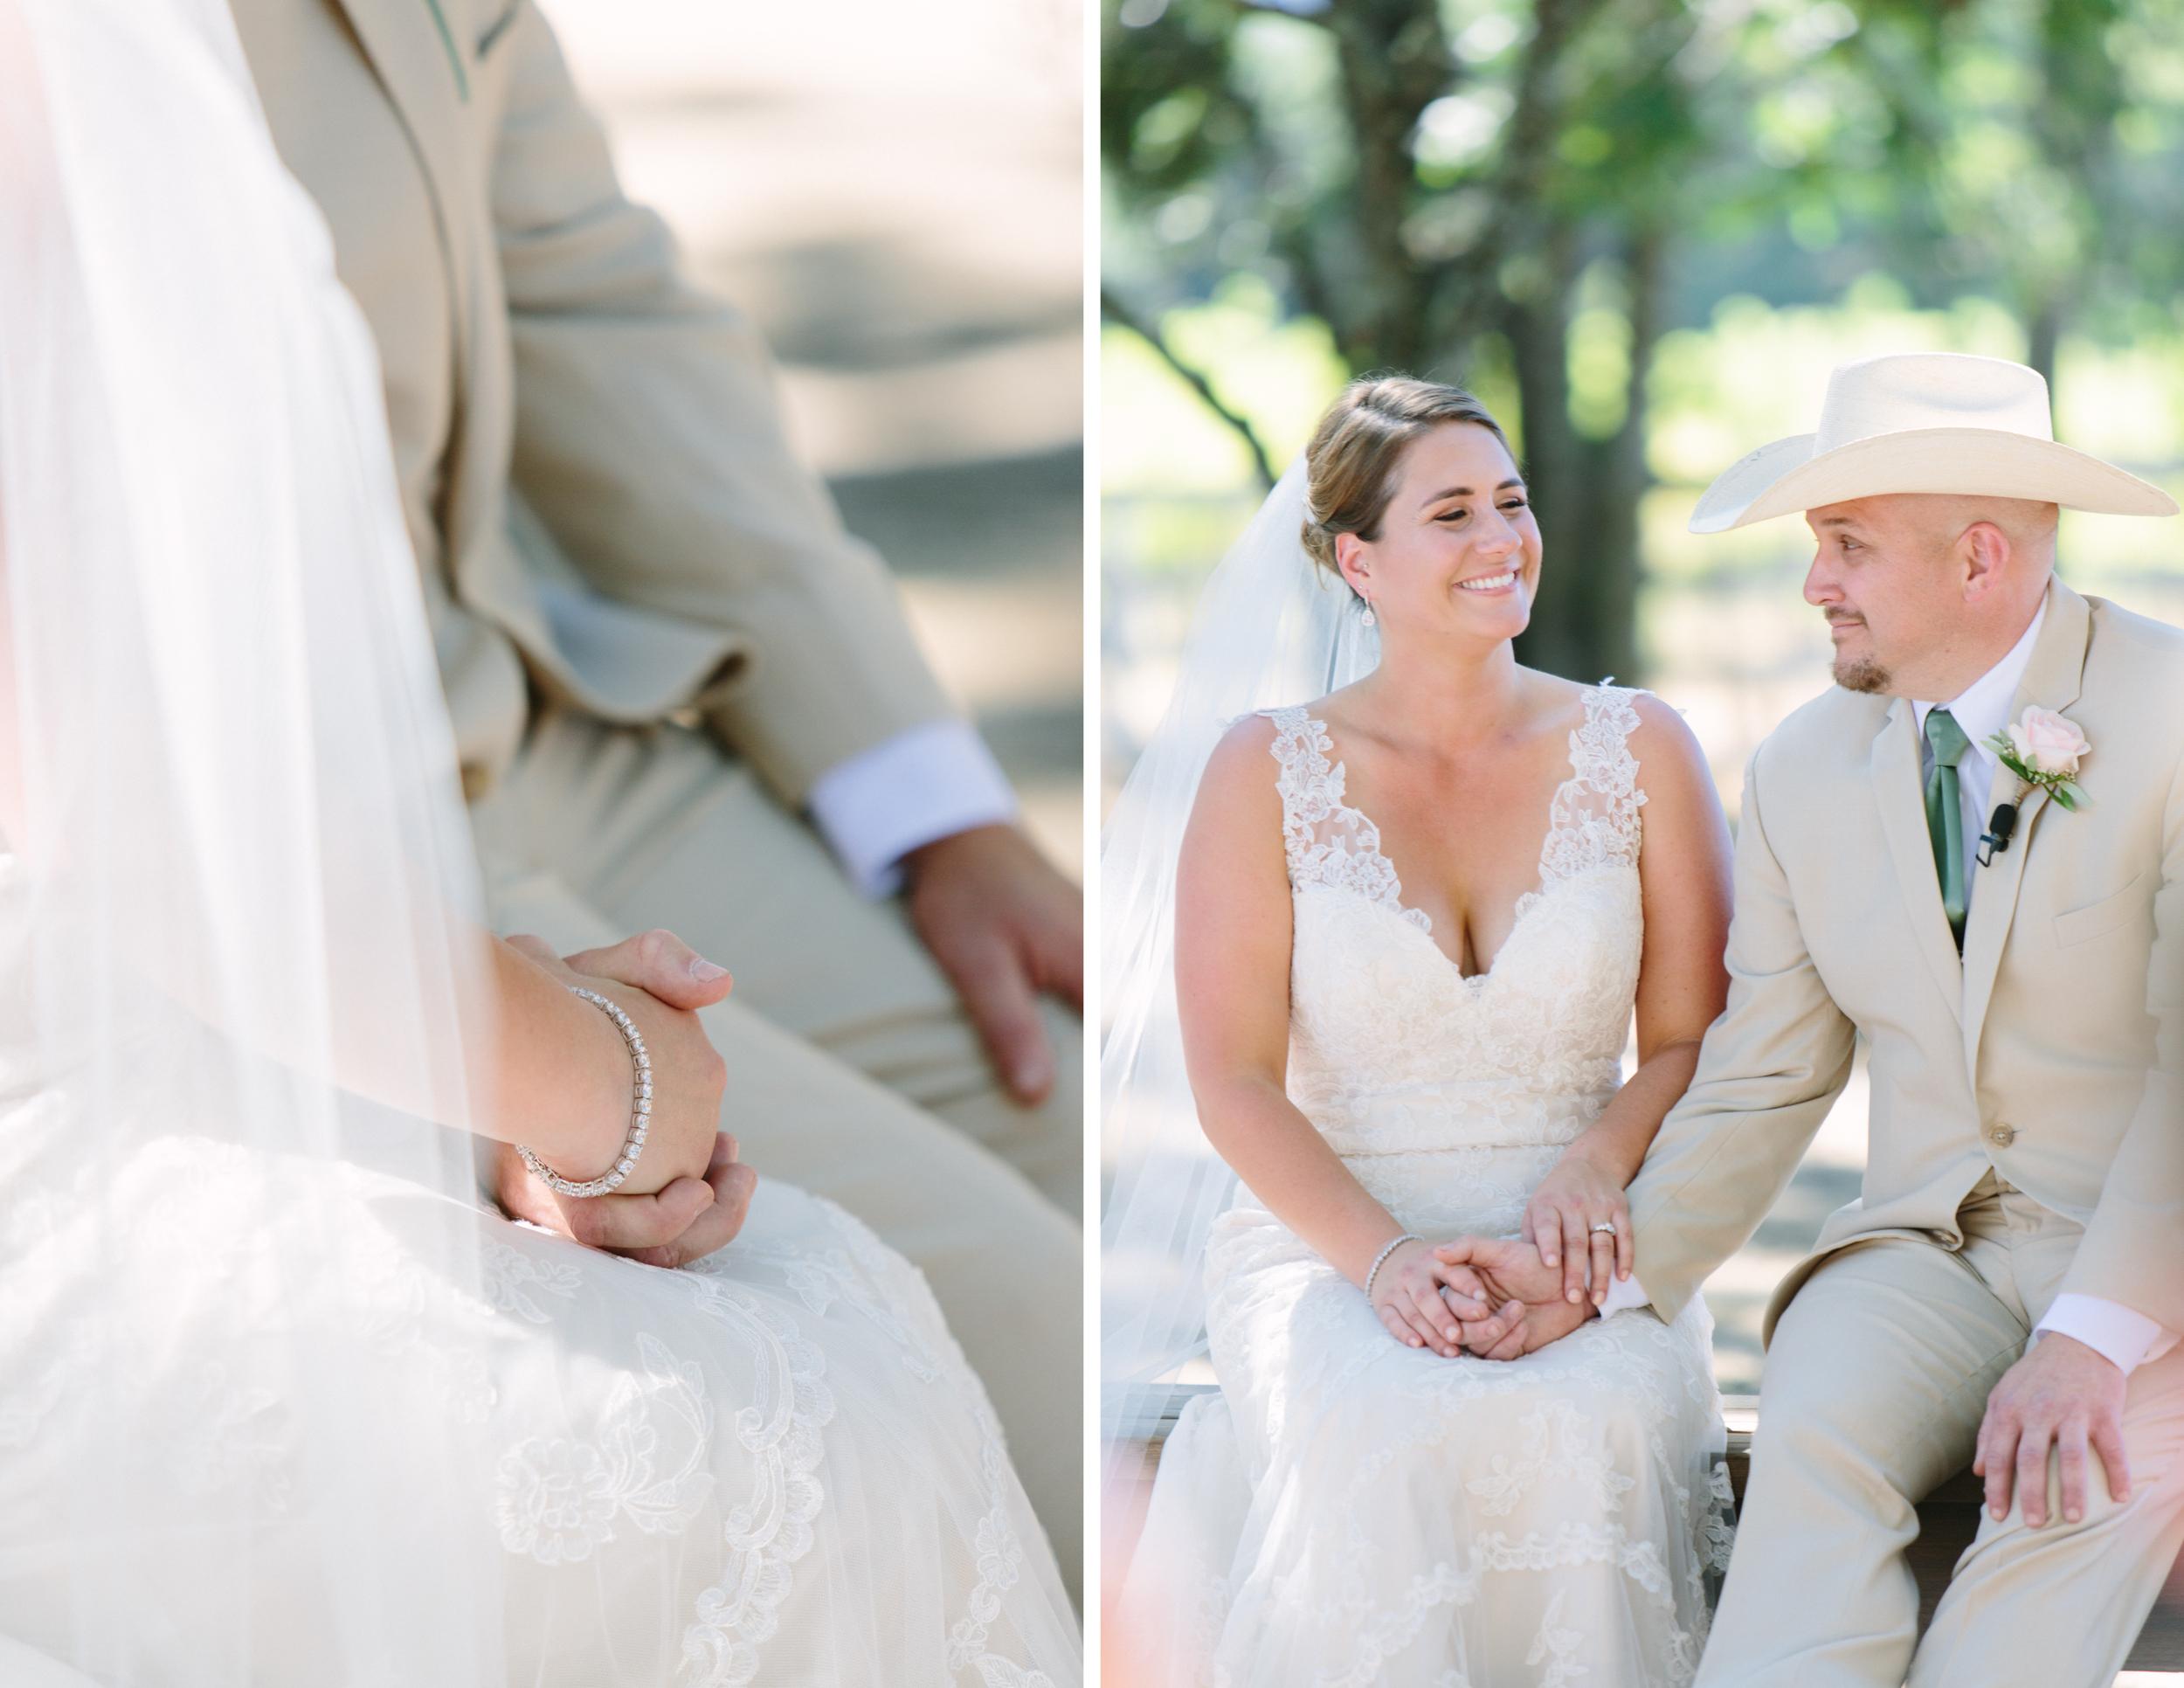 sonoma ranch wedding 7.jpg